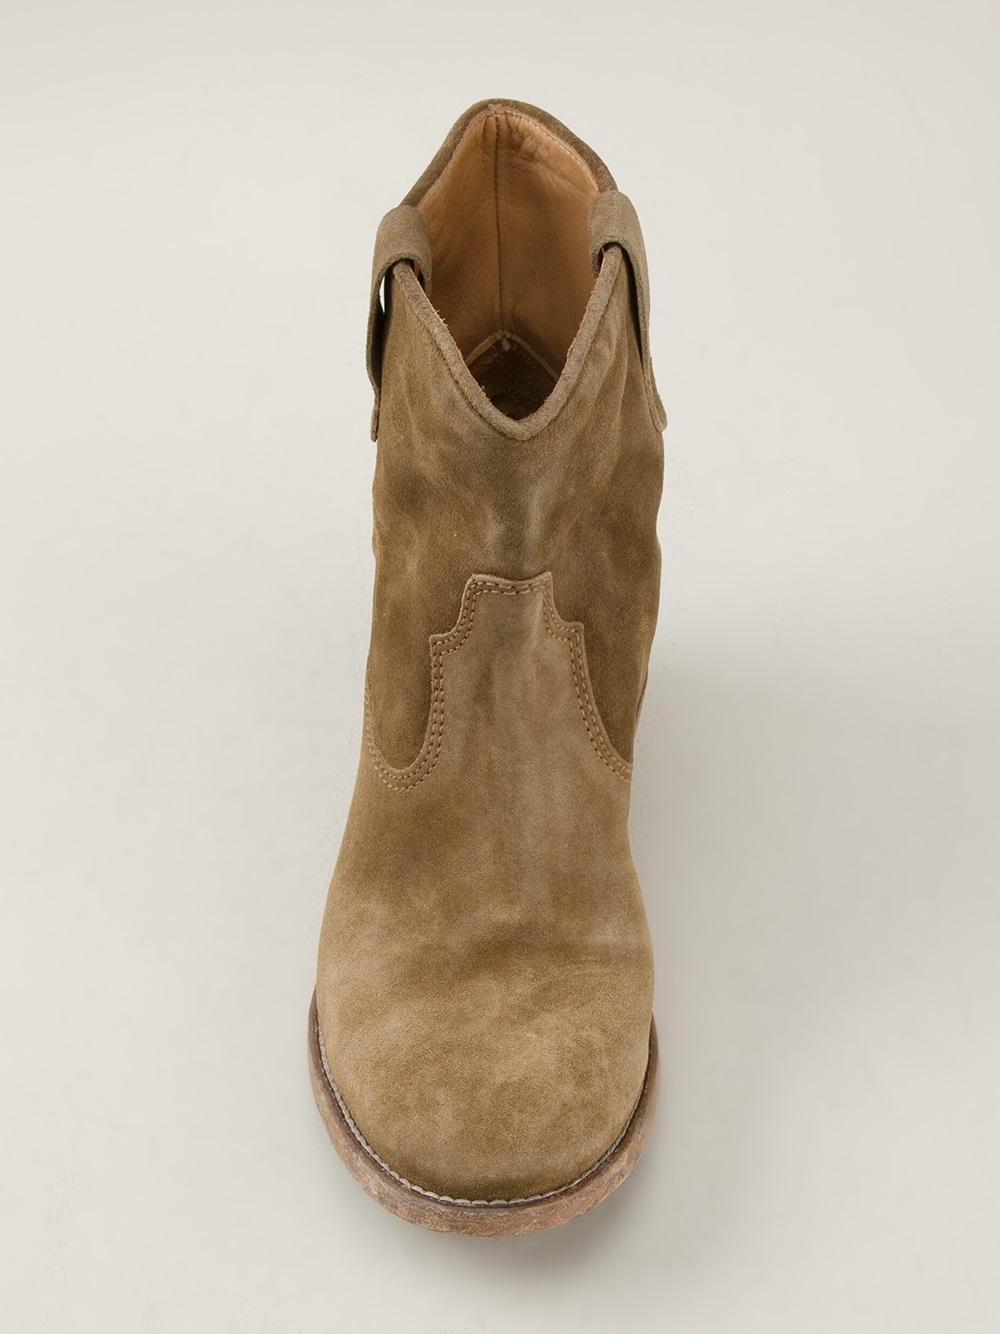 Isabel Marant Besley Short Boot in Blue (Natural)